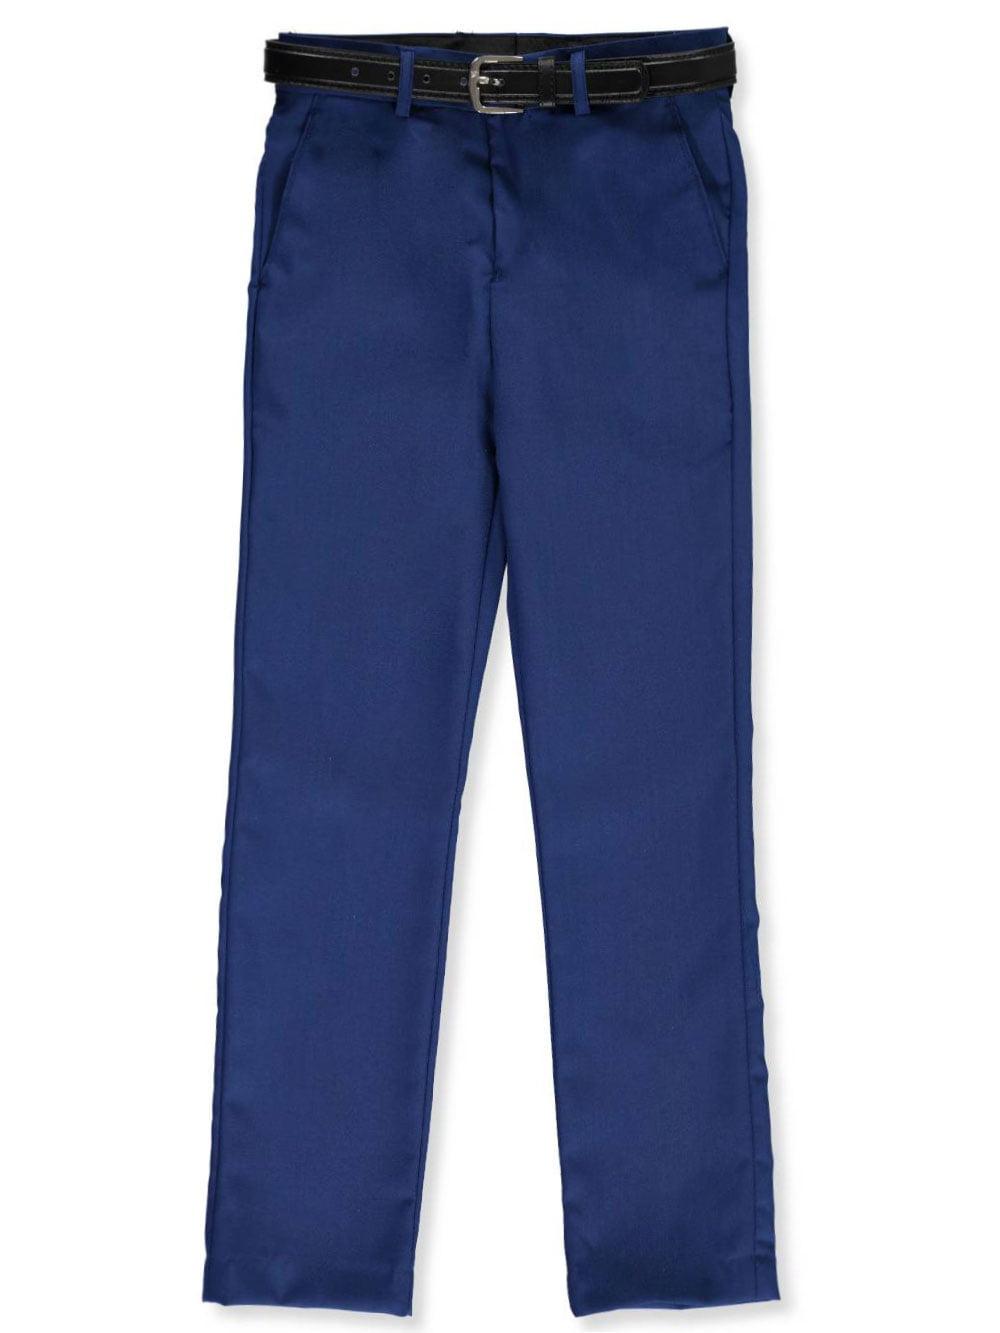 Alberto Danelli Boys Flat Front Belted Dress Pants